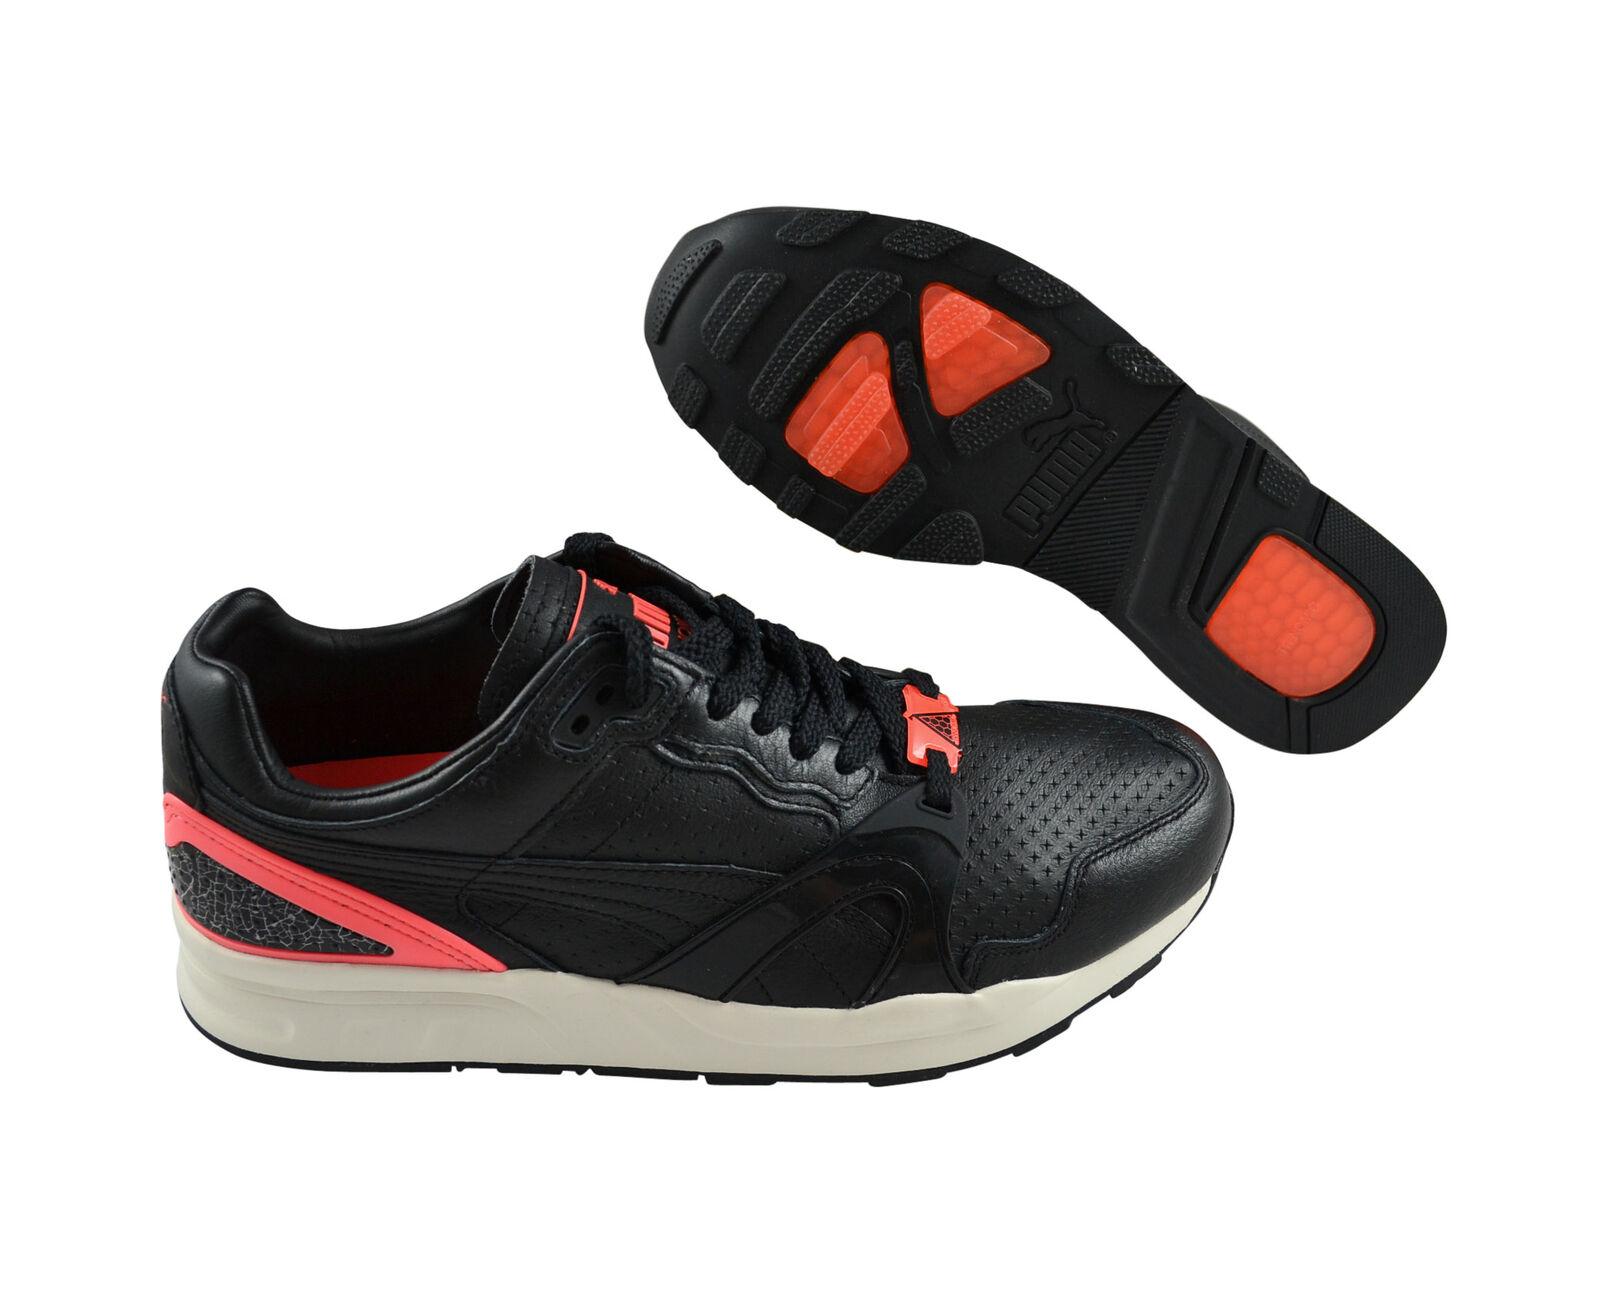 Puma Trinomic XT2+ CRKL black/pink Sneaker/Schuhe 357774 01